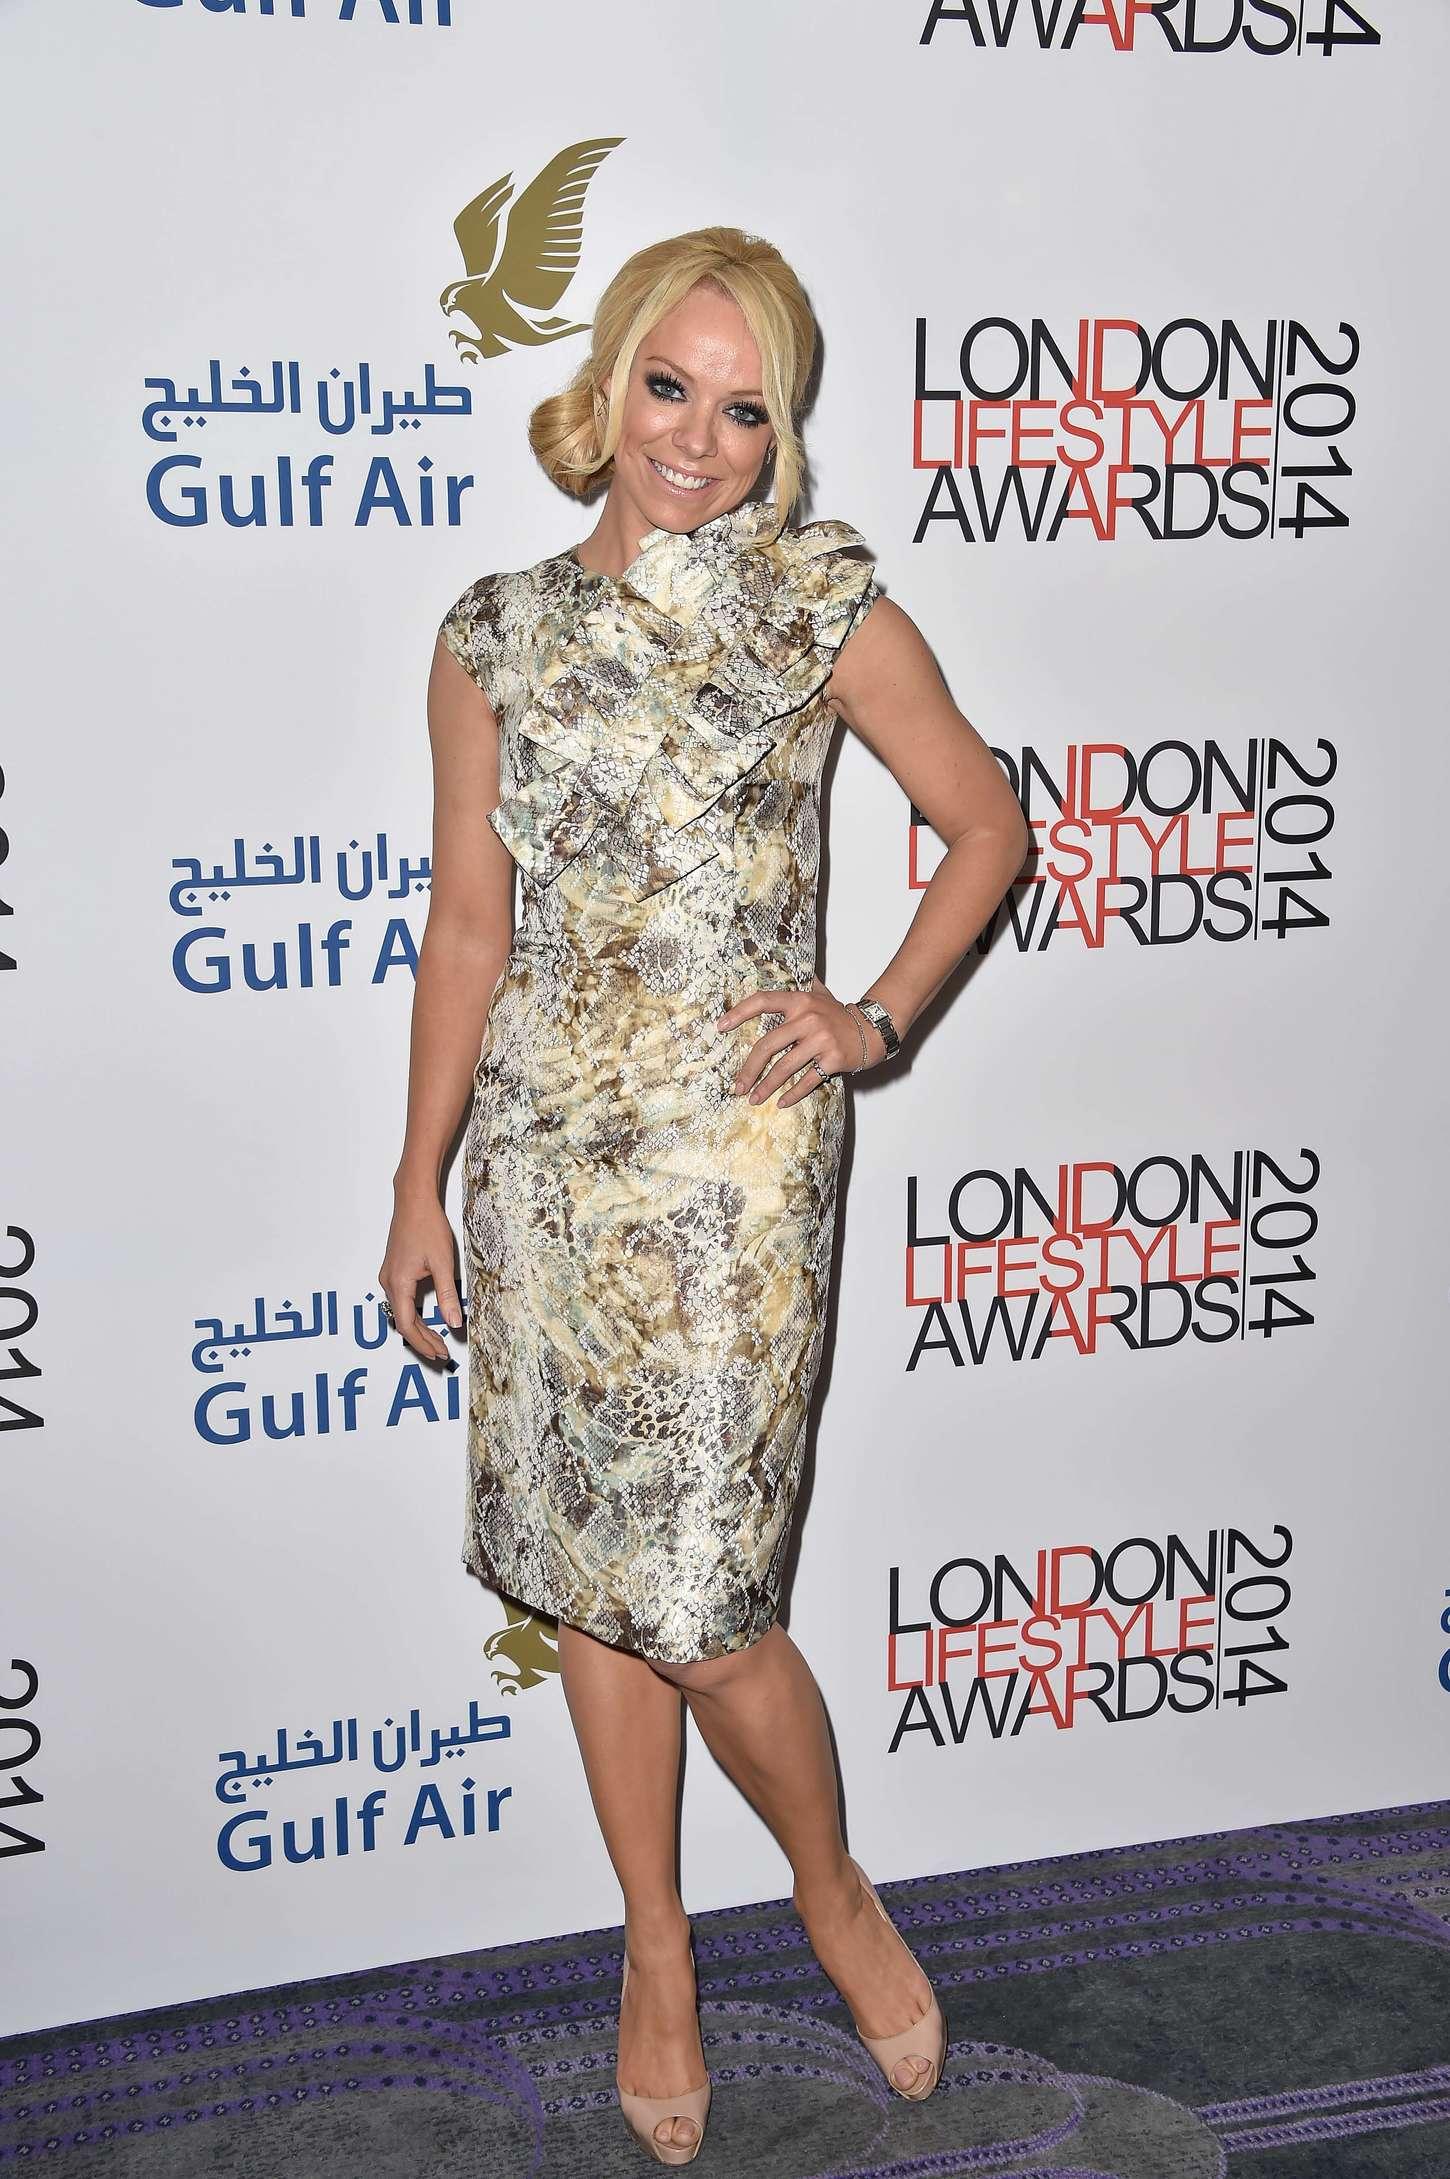 Liz McClarnon at London Lifestyle Awards